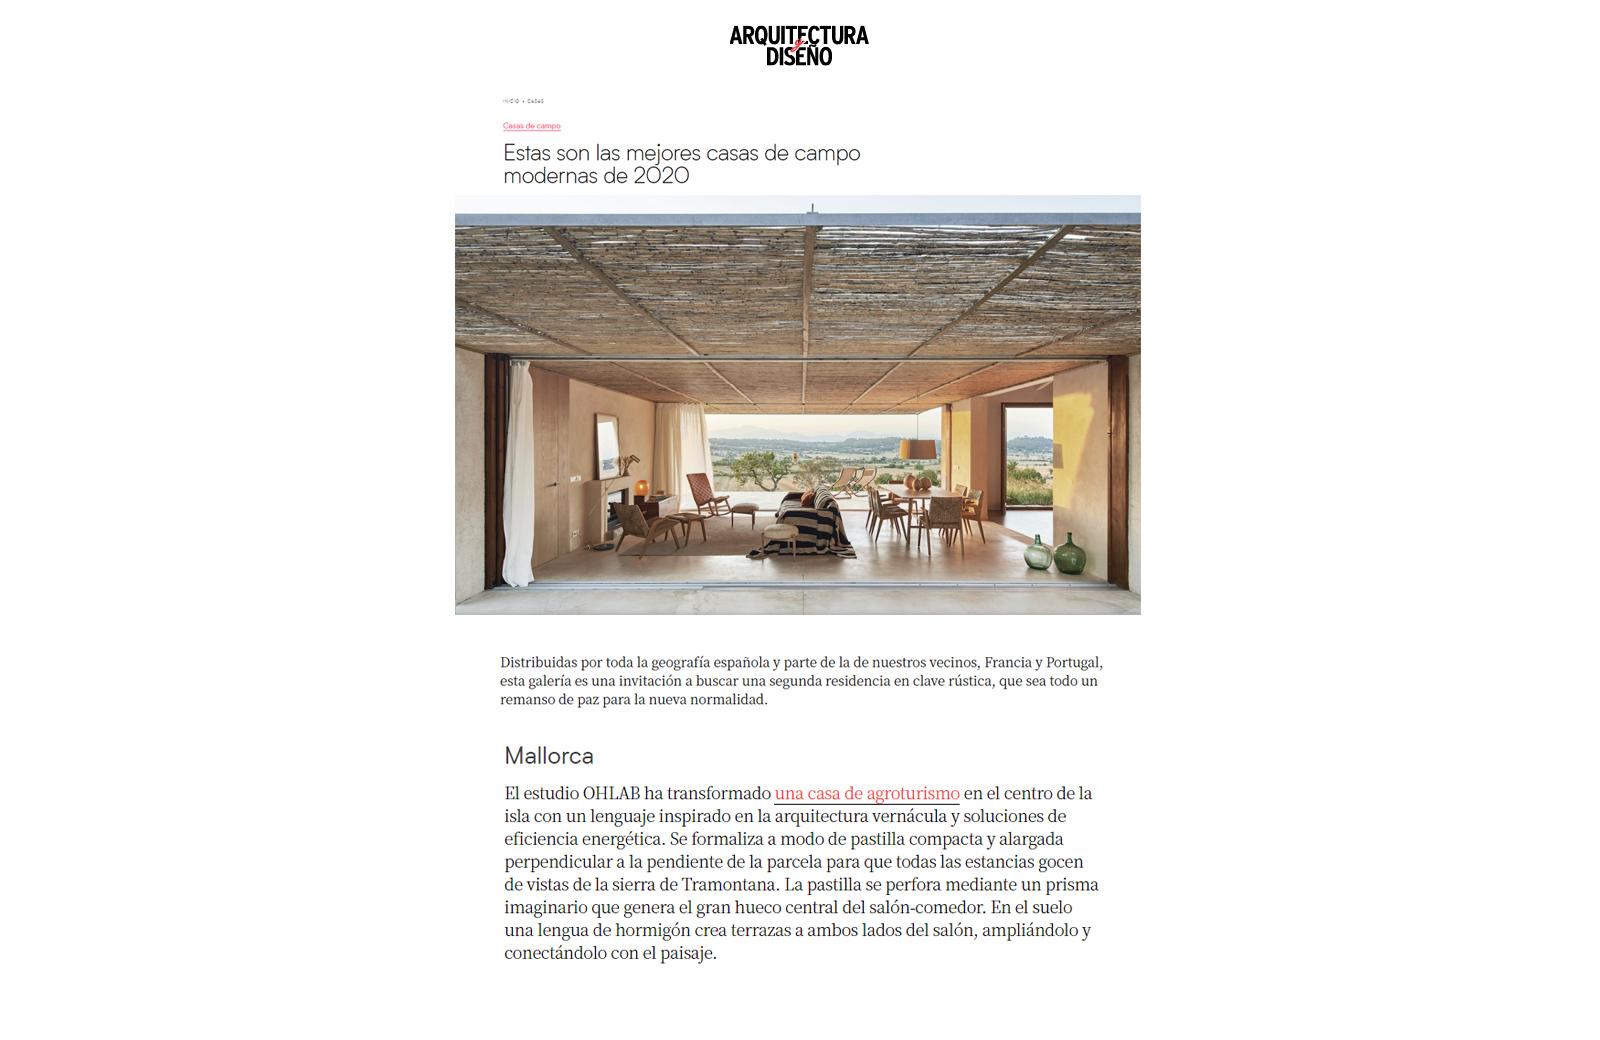 arquitectura-y-diseno-201016-1600x1040